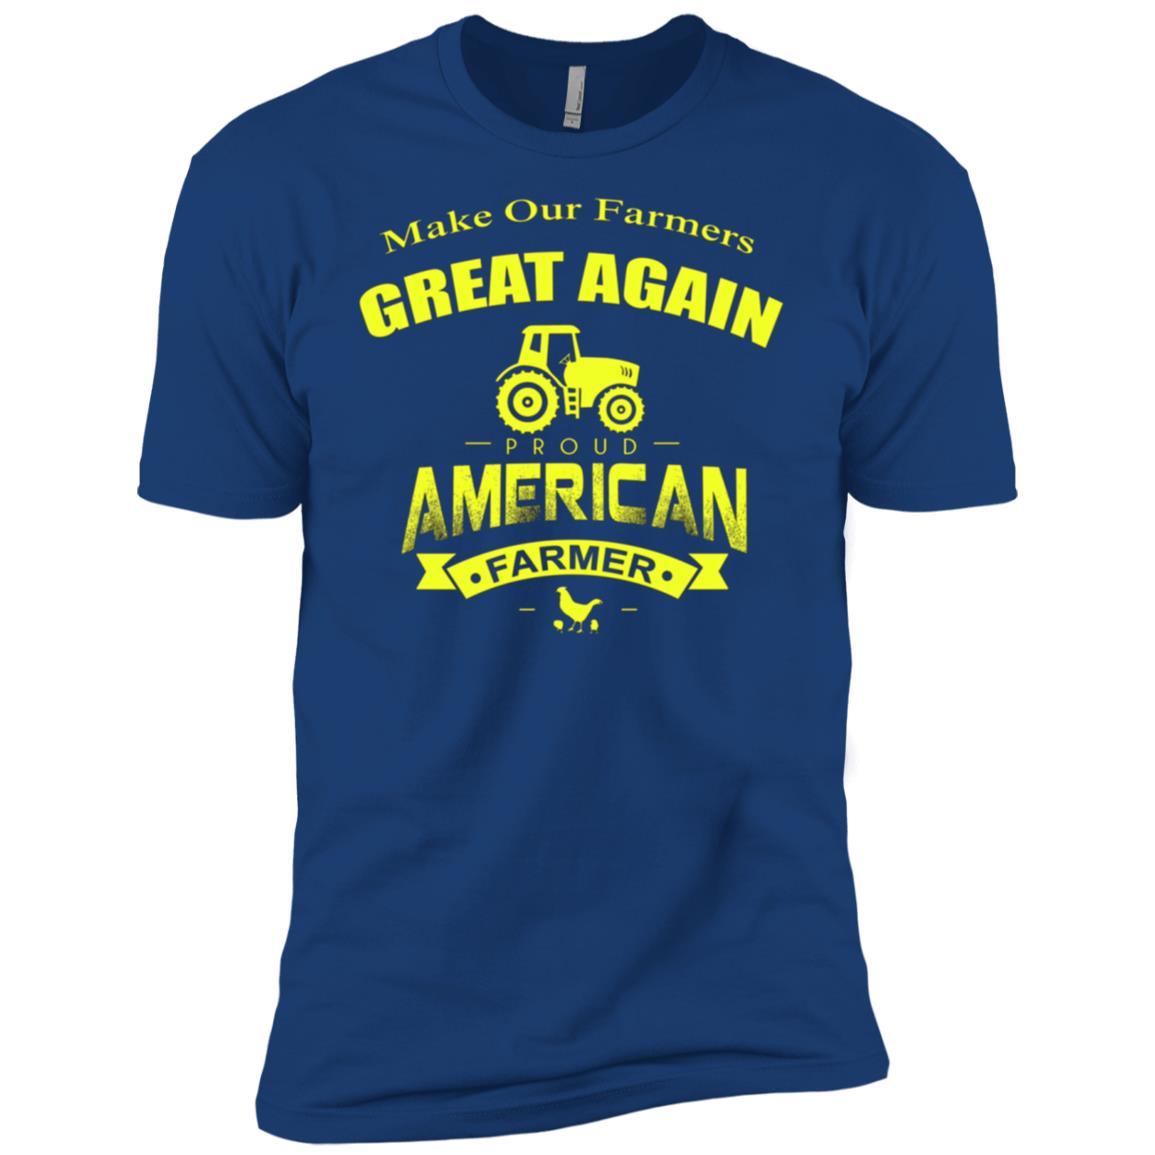 Make Our Farmers Great Again American Patriot Trump Gift T-1 Men Short Sleeve T-Shirt